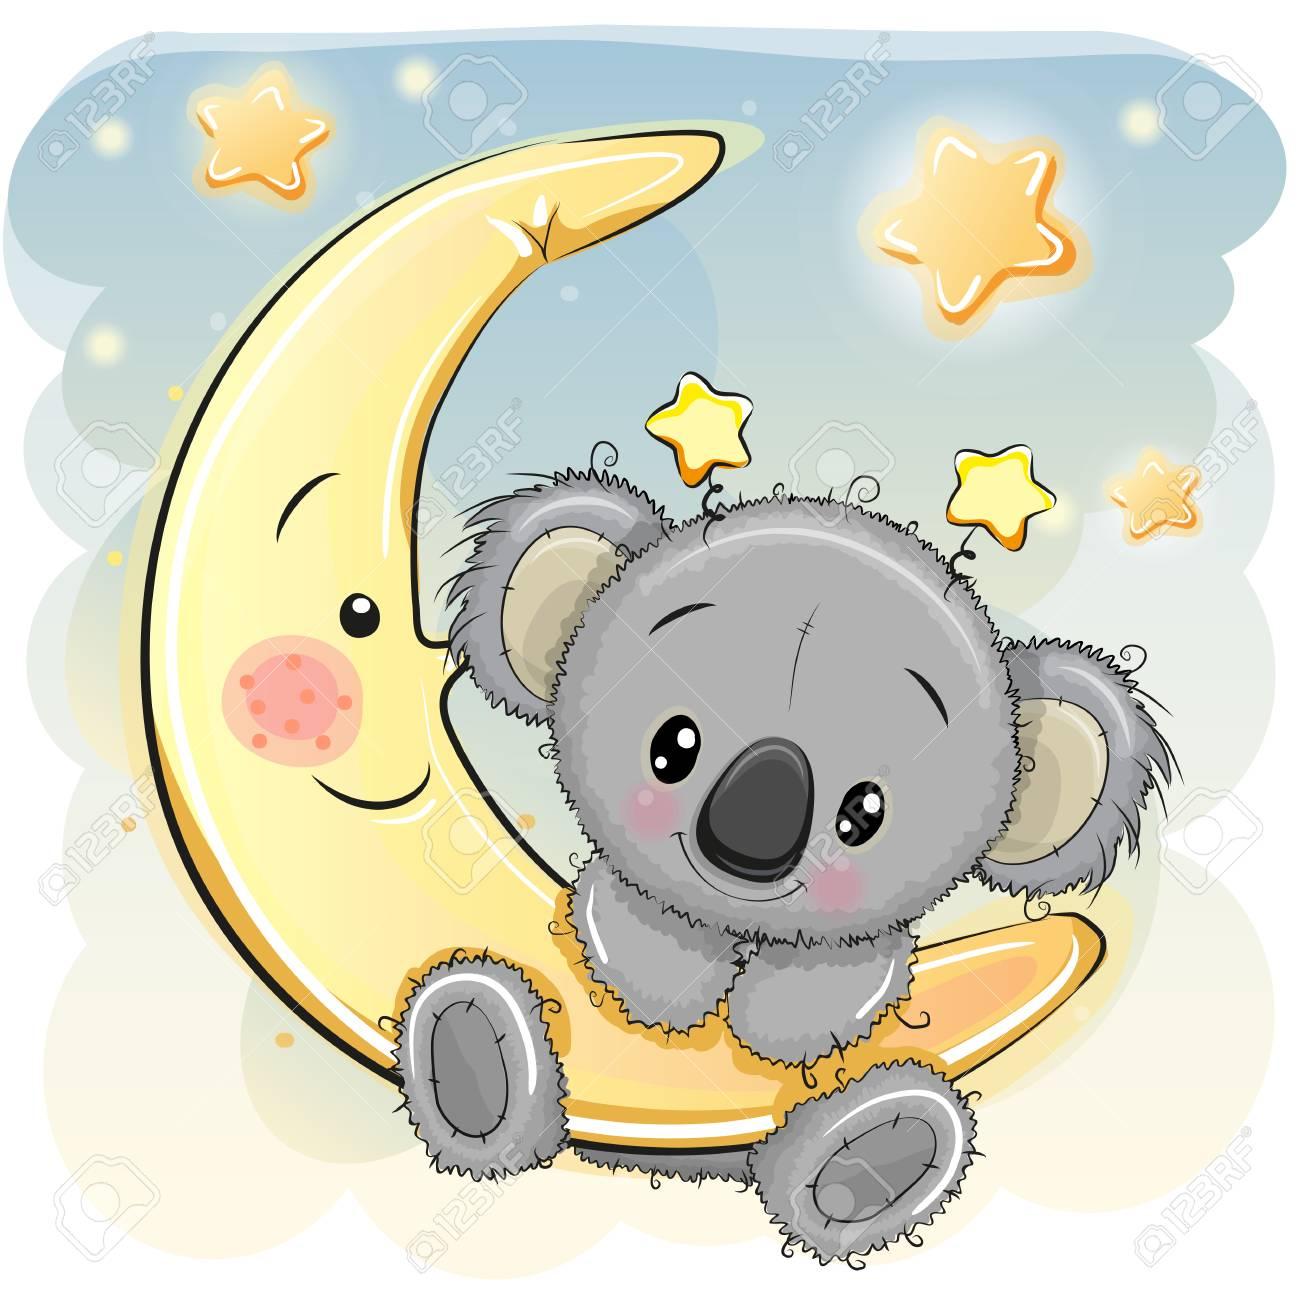 Greeting card cute cartoon koala on the moon royalty free cliparts greeting card cute cartoon koala on the moon stock vector 88086179 m4hsunfo